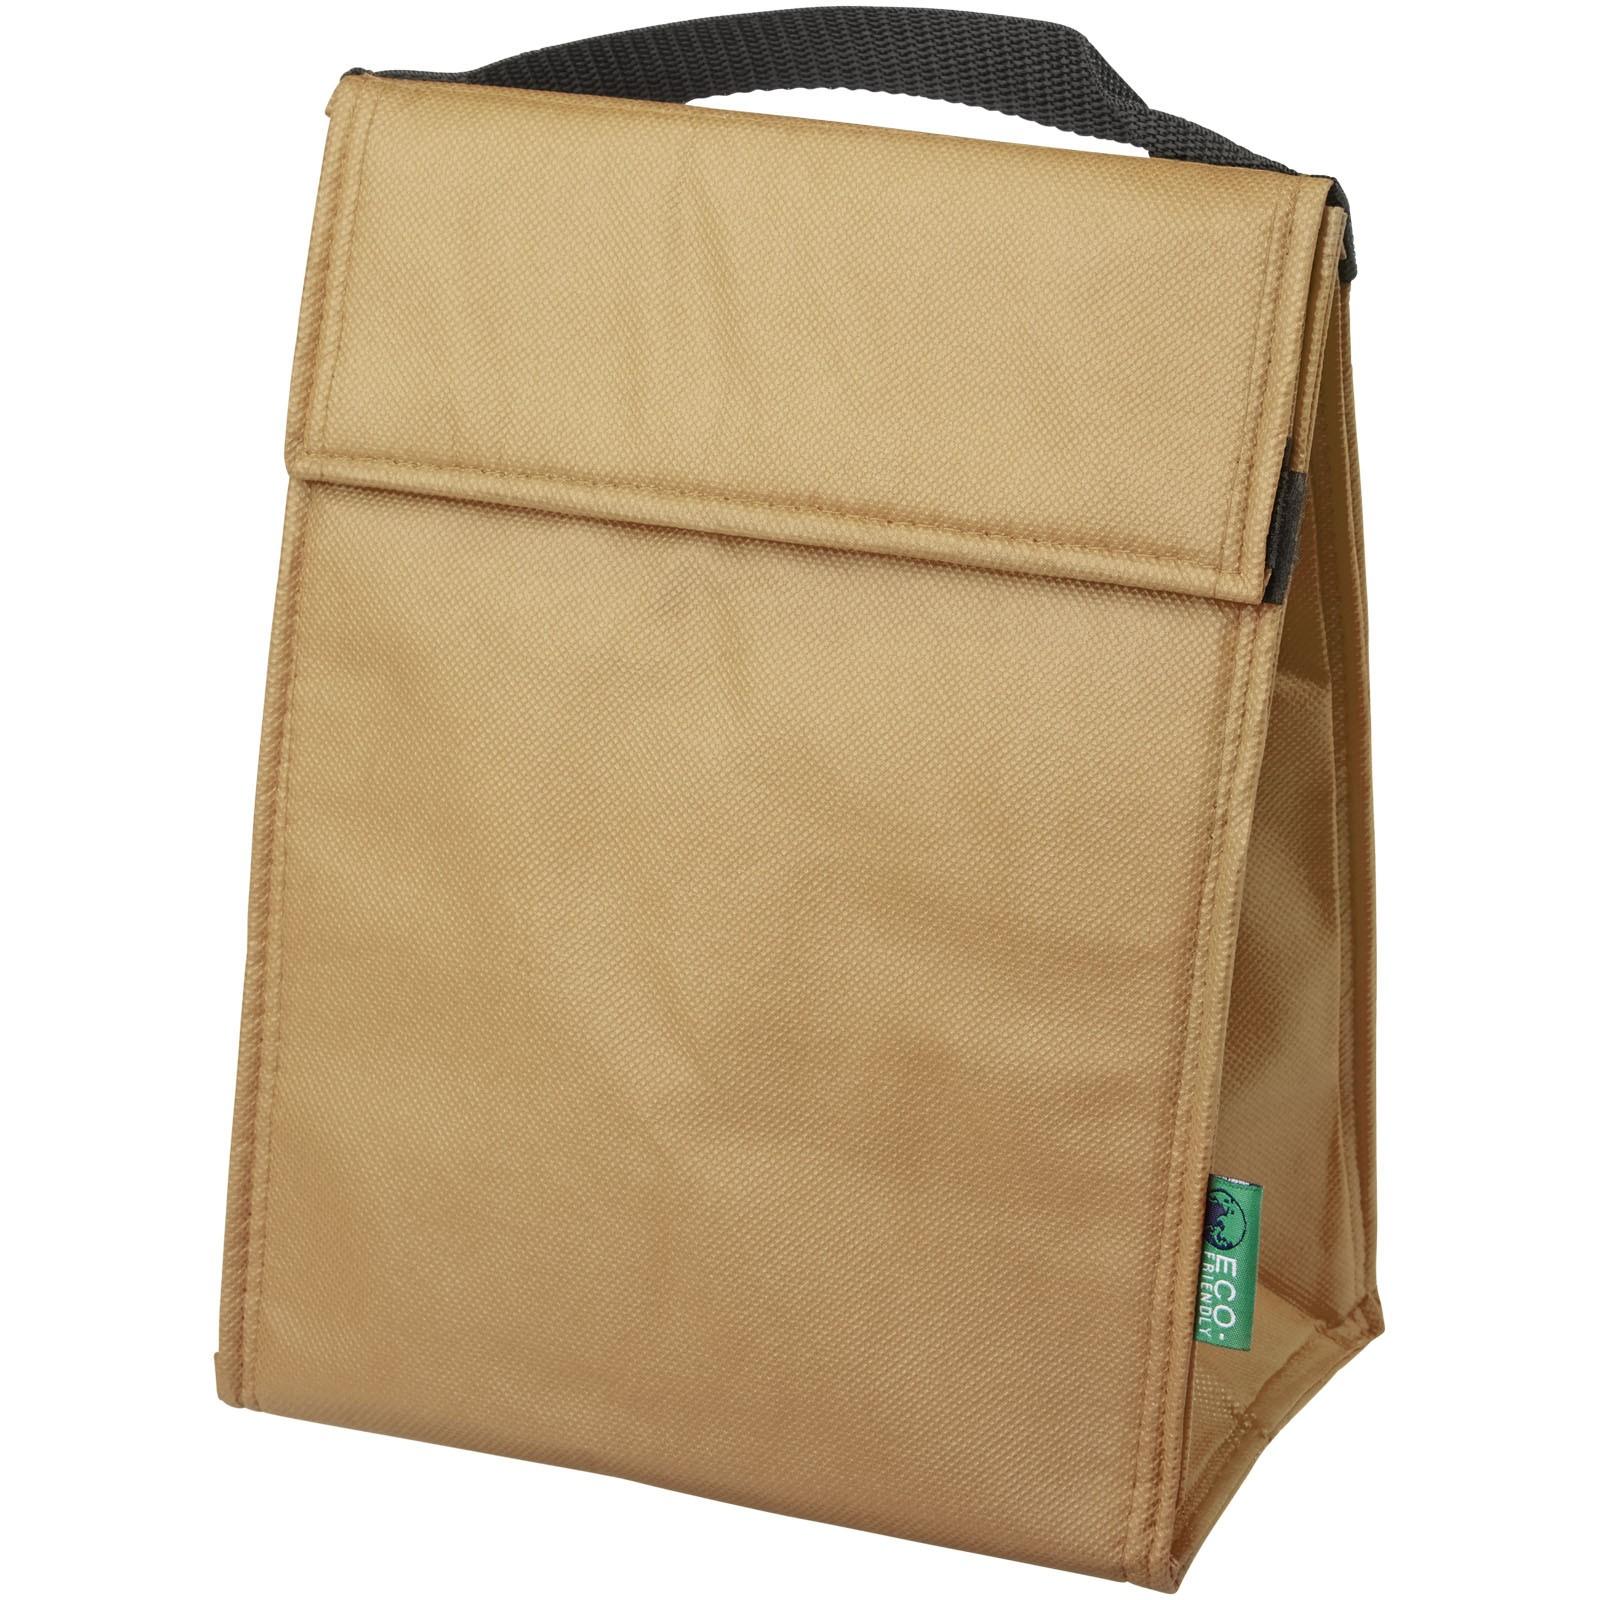 Triangle cooler bag - Natural